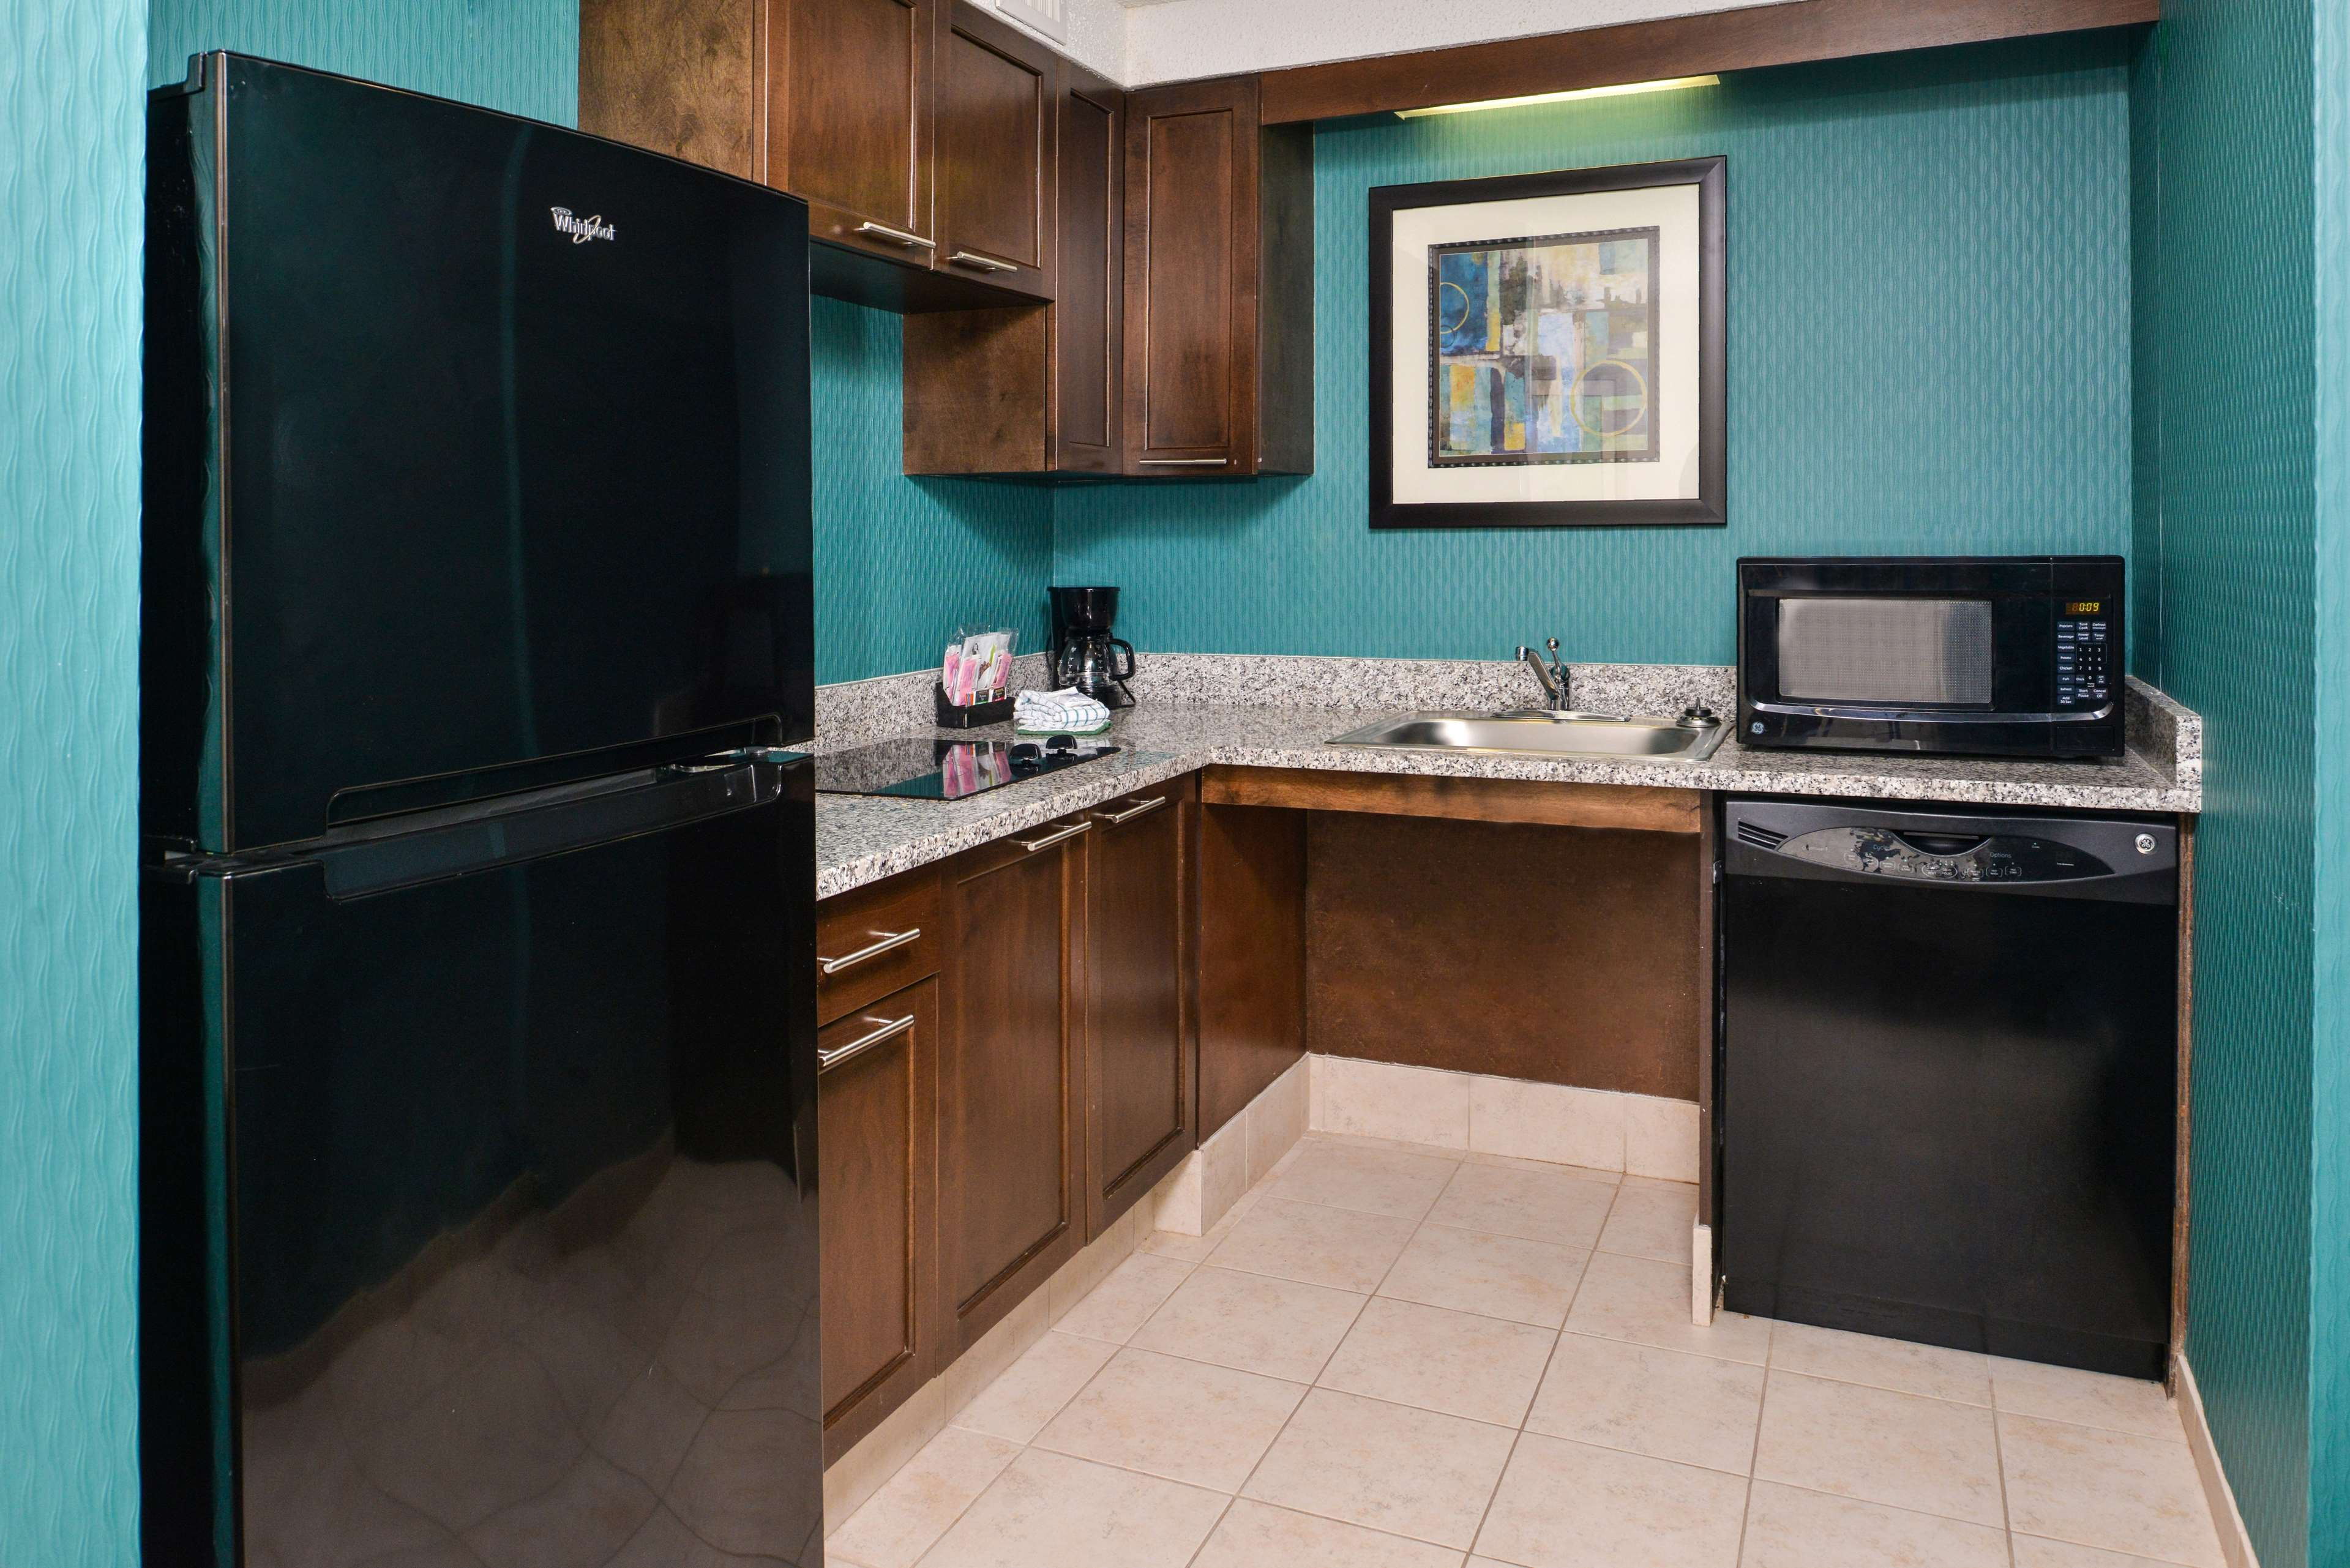 Hampton Inn & Suites Newport News (Oyster Point) image 33